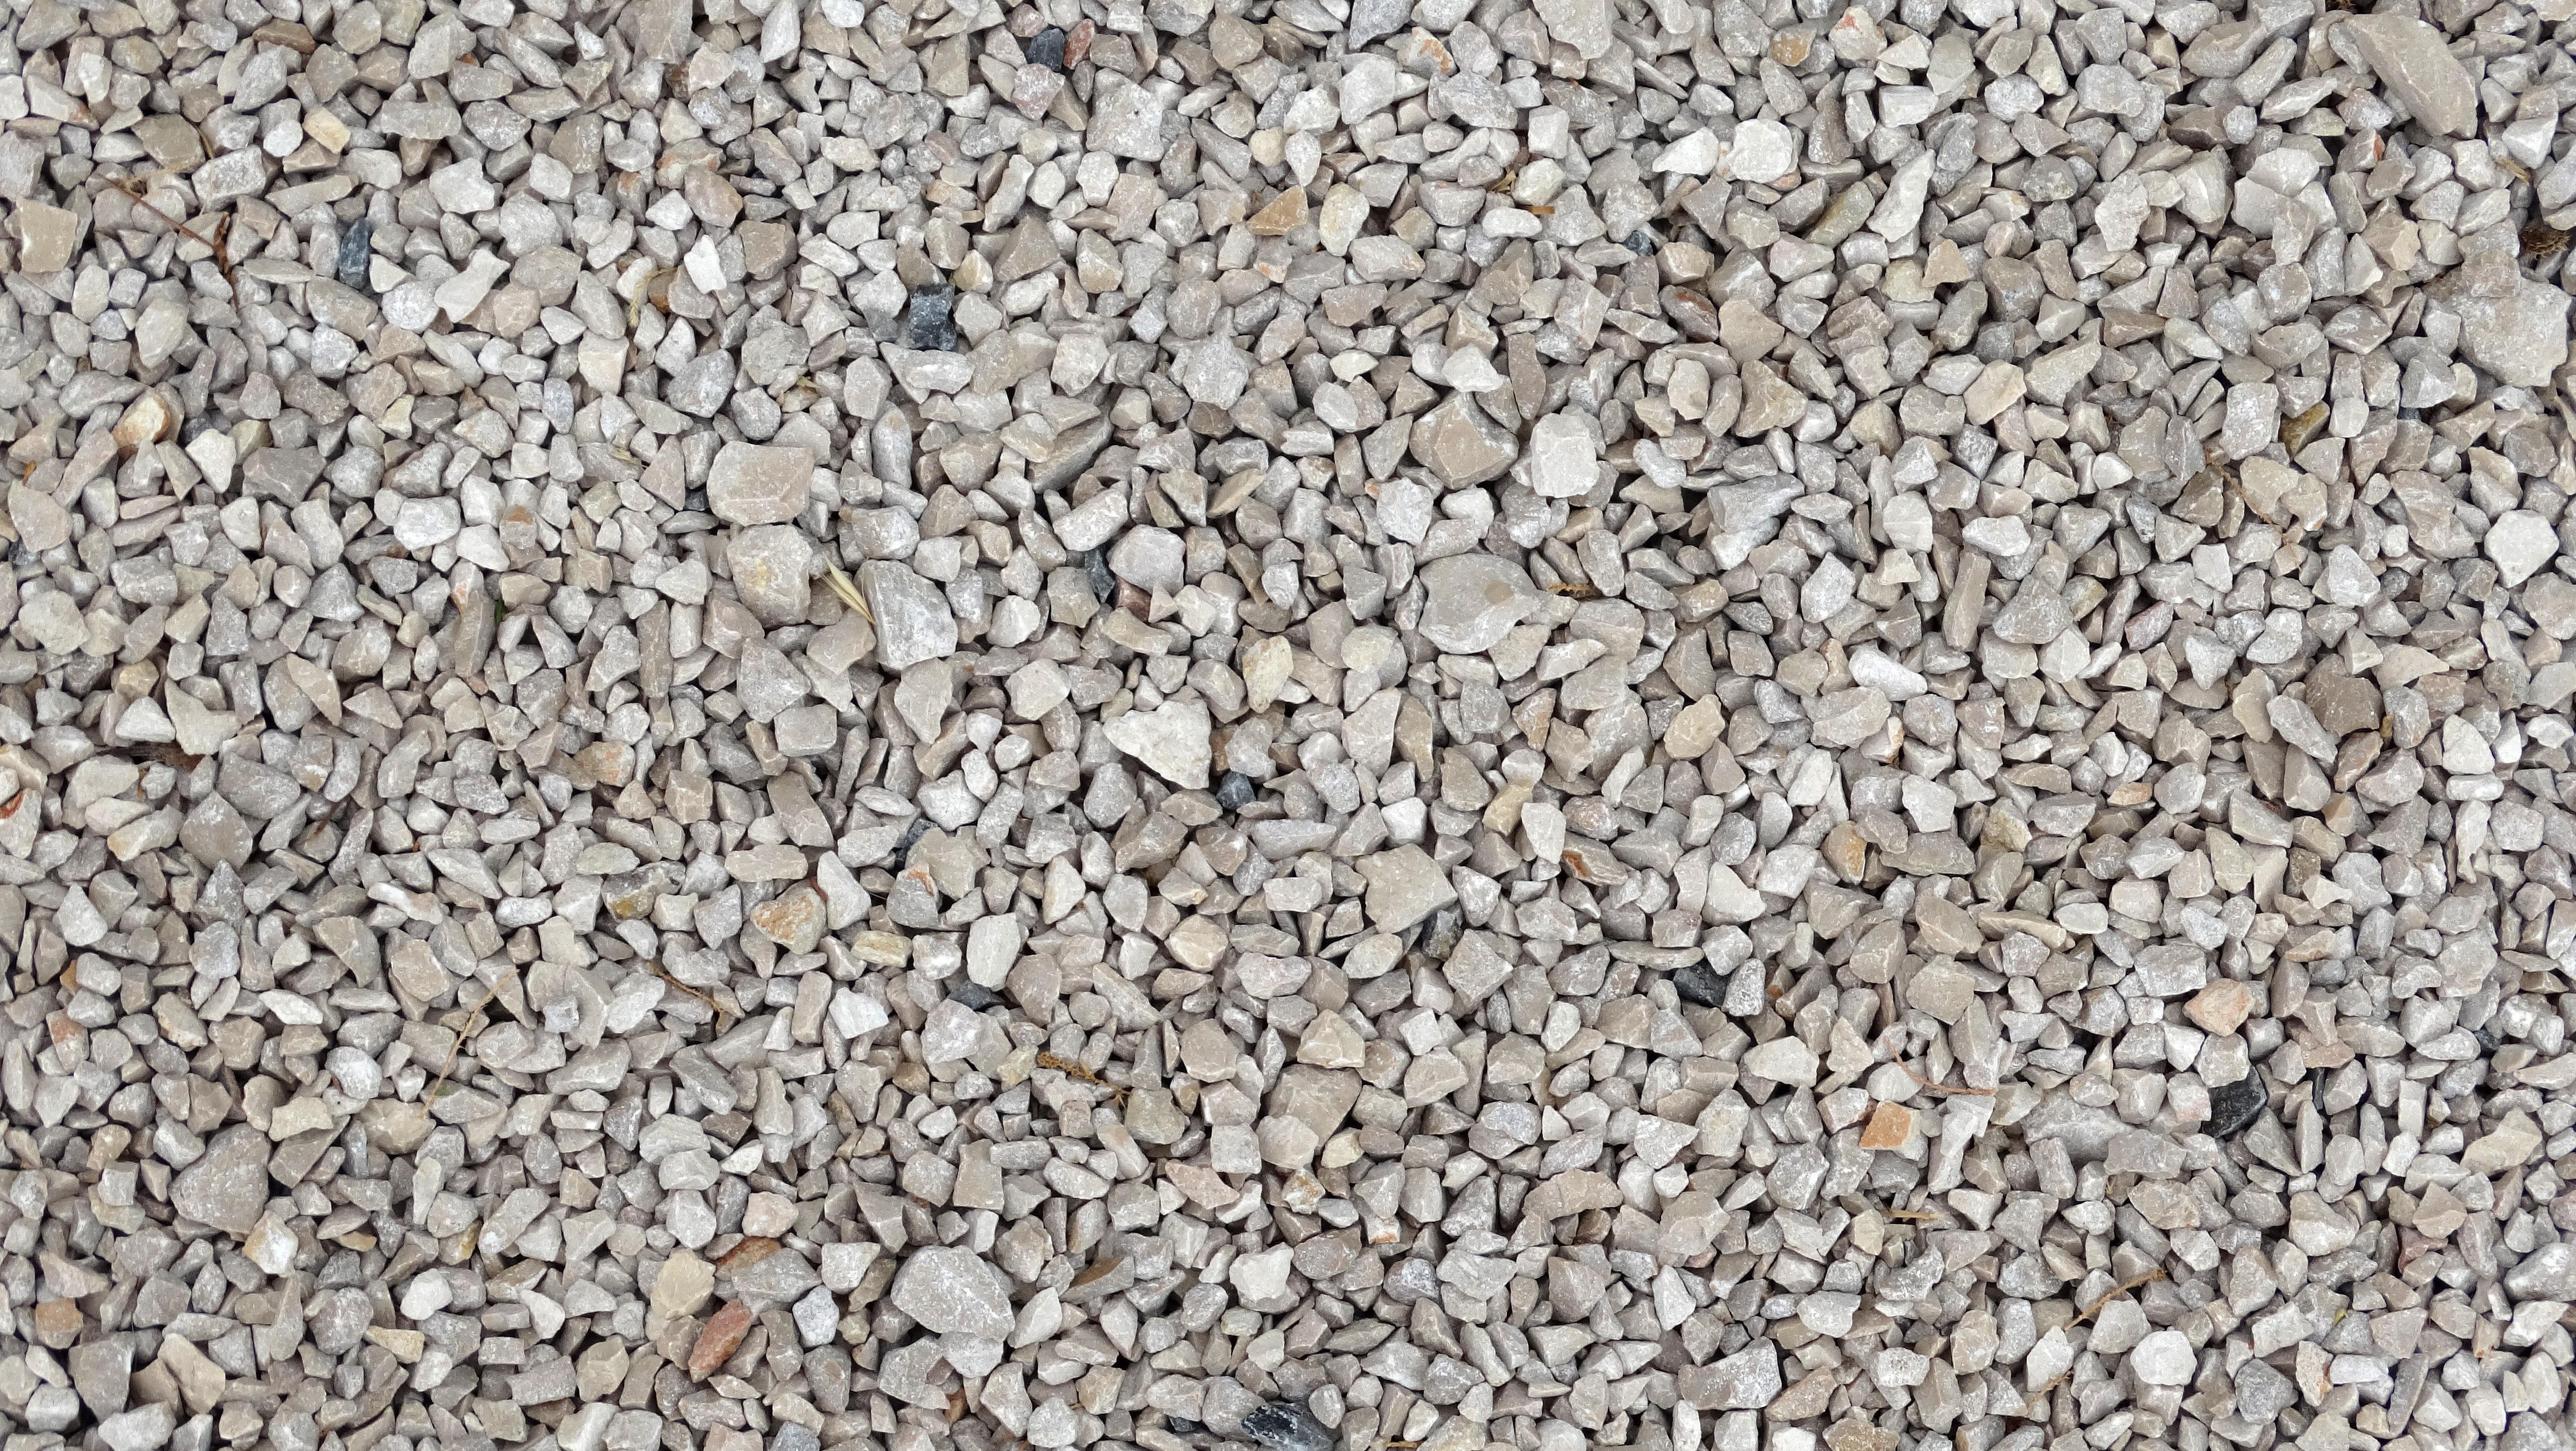 Nature Outdoor Sand Rock Stone Asphalt Macro Pebble Clean Soil Material Surface Grey Rubble Gravel Flooring